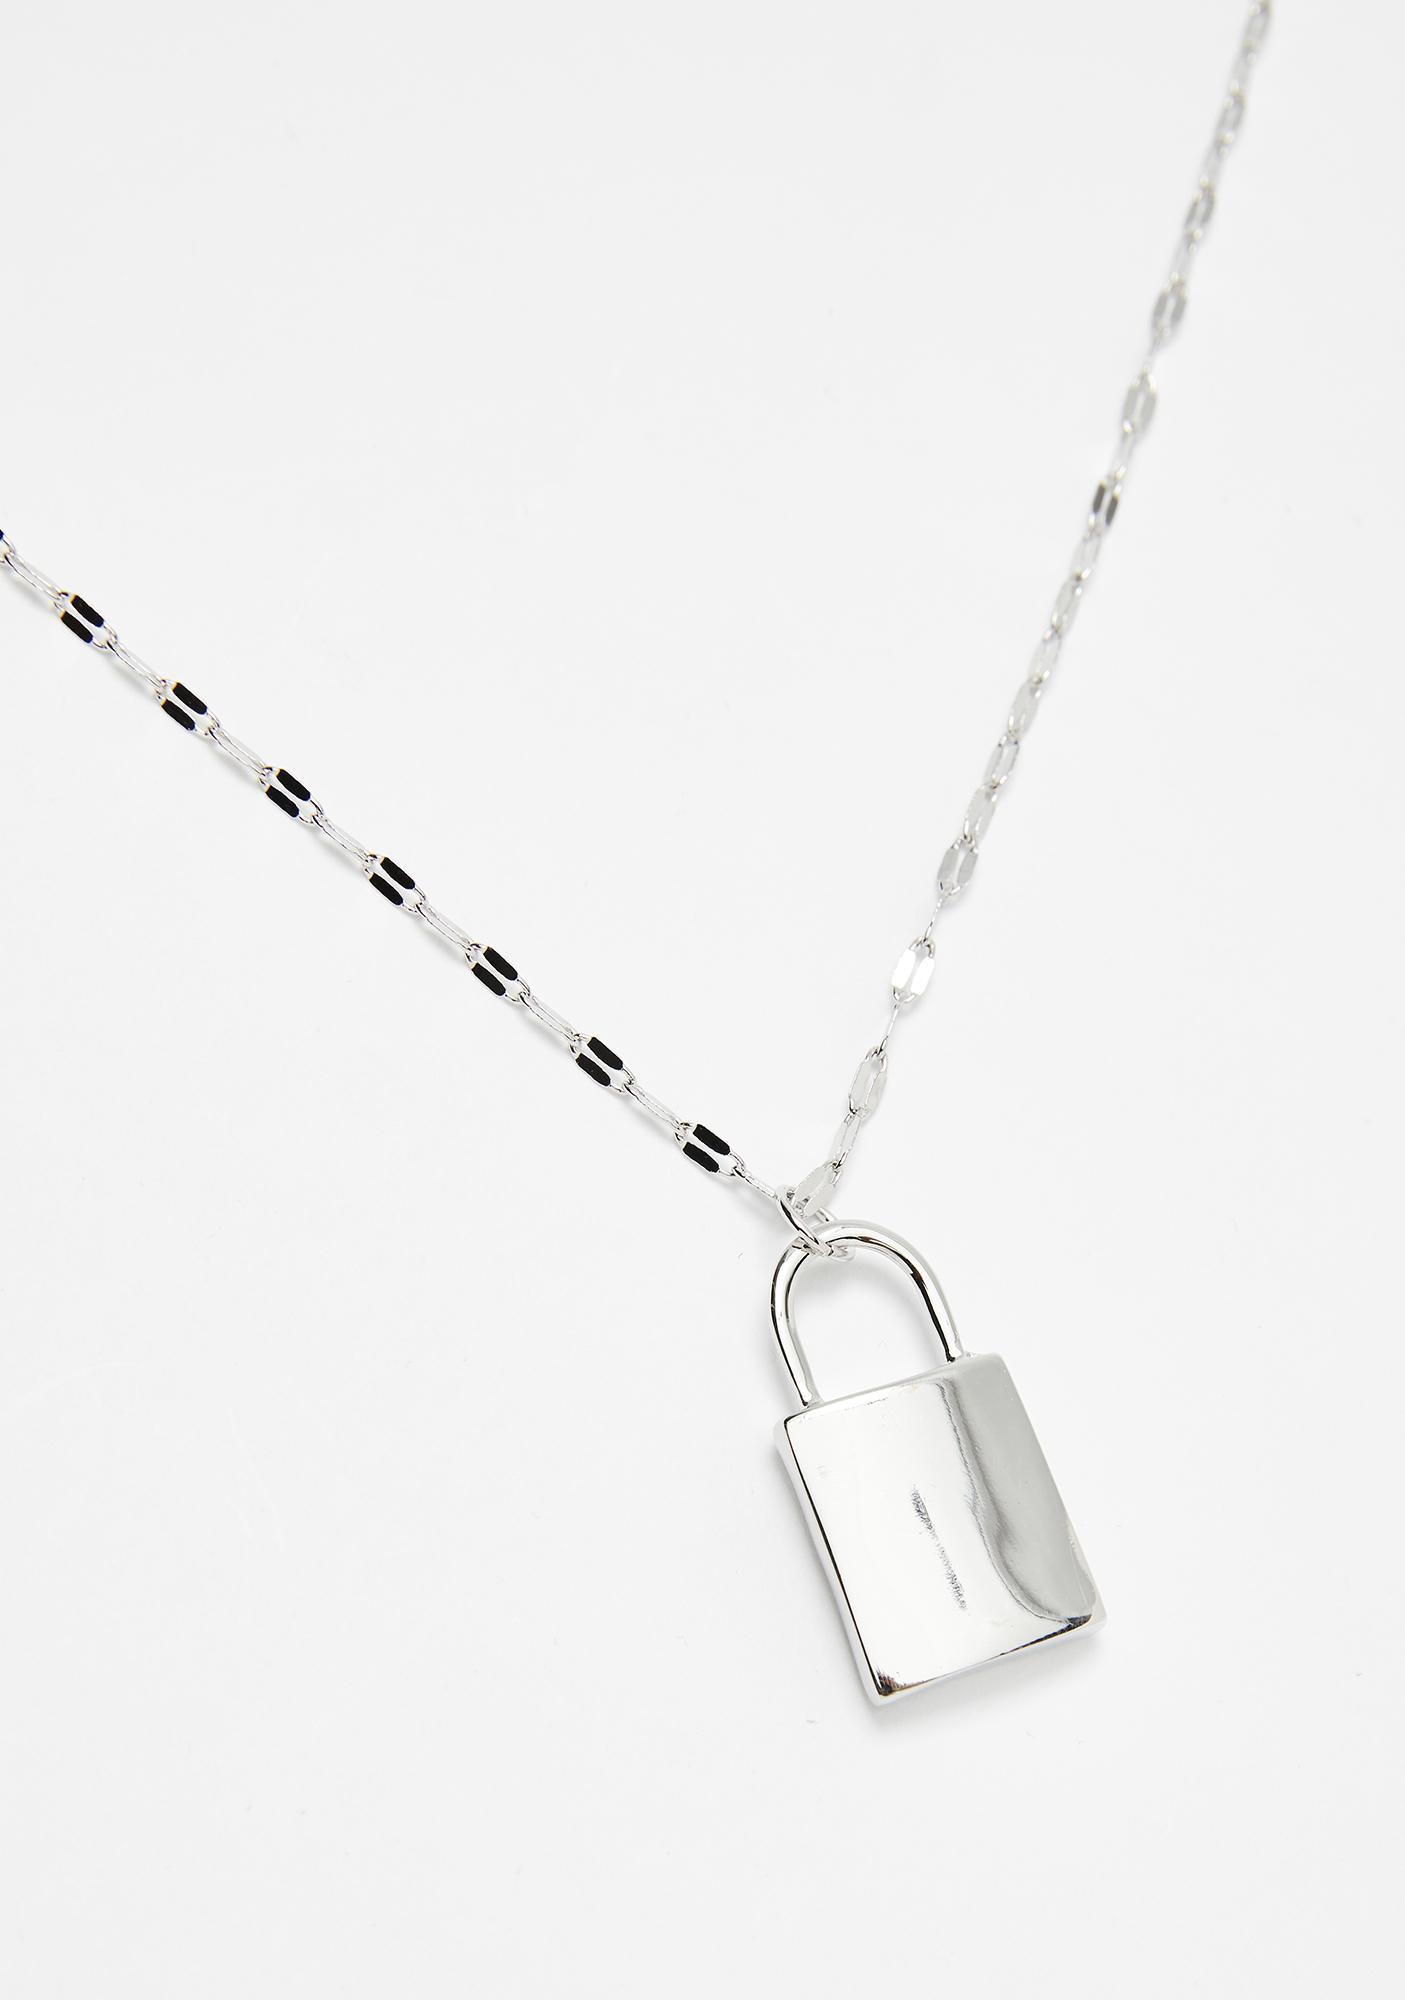 Metal Steal Ur Heart Lock Necklace